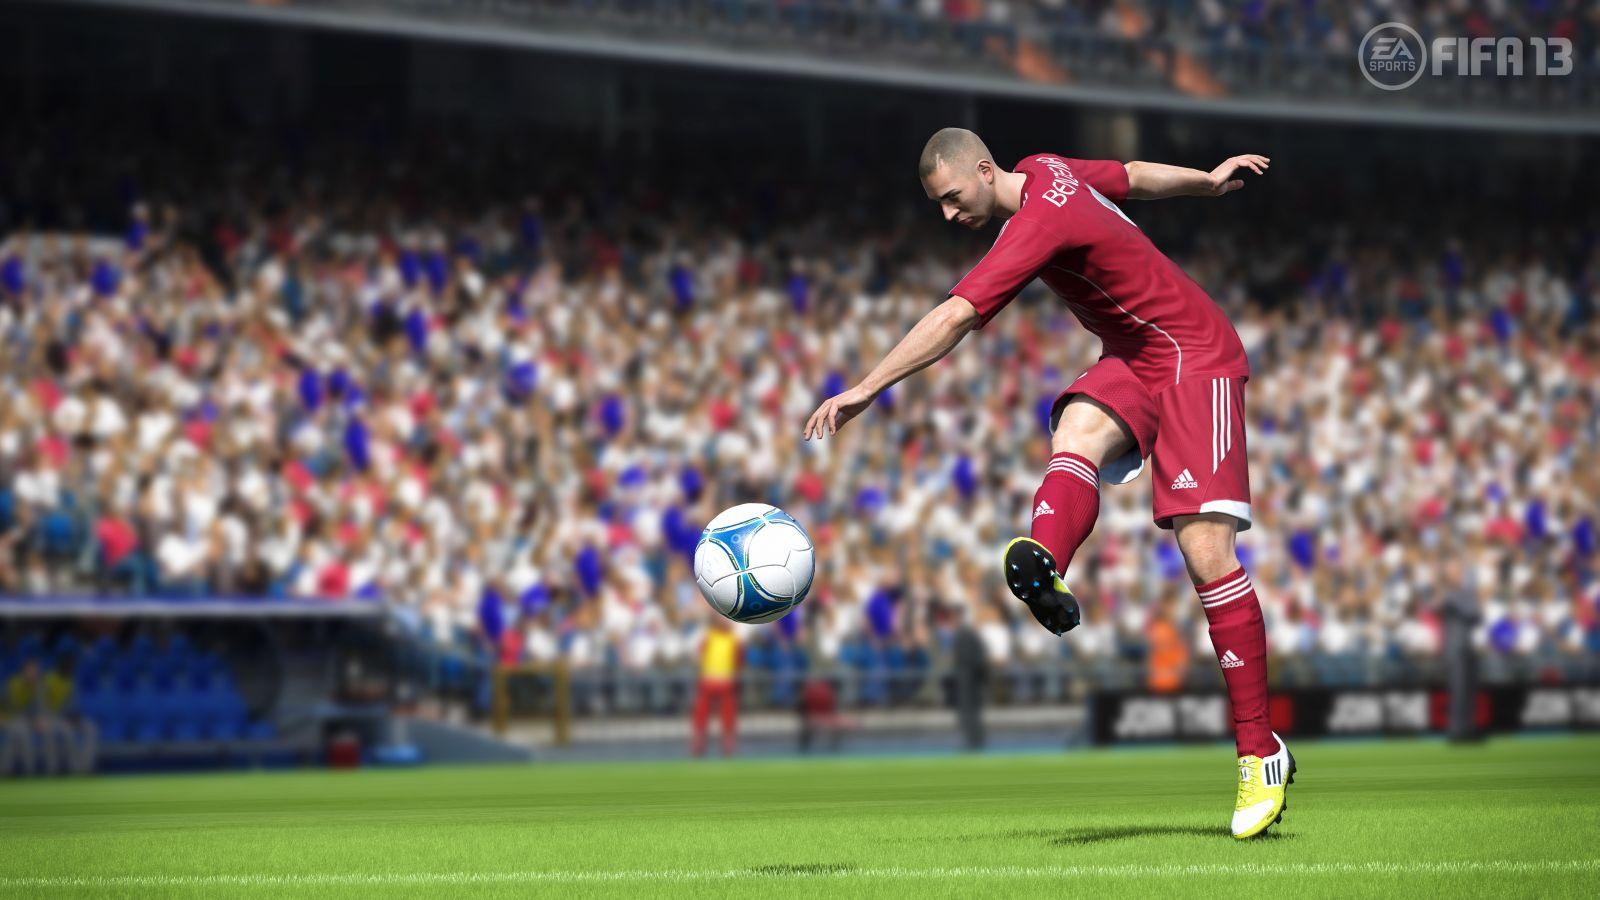 FIFA 13 – fotbálek jedna báseň 70574